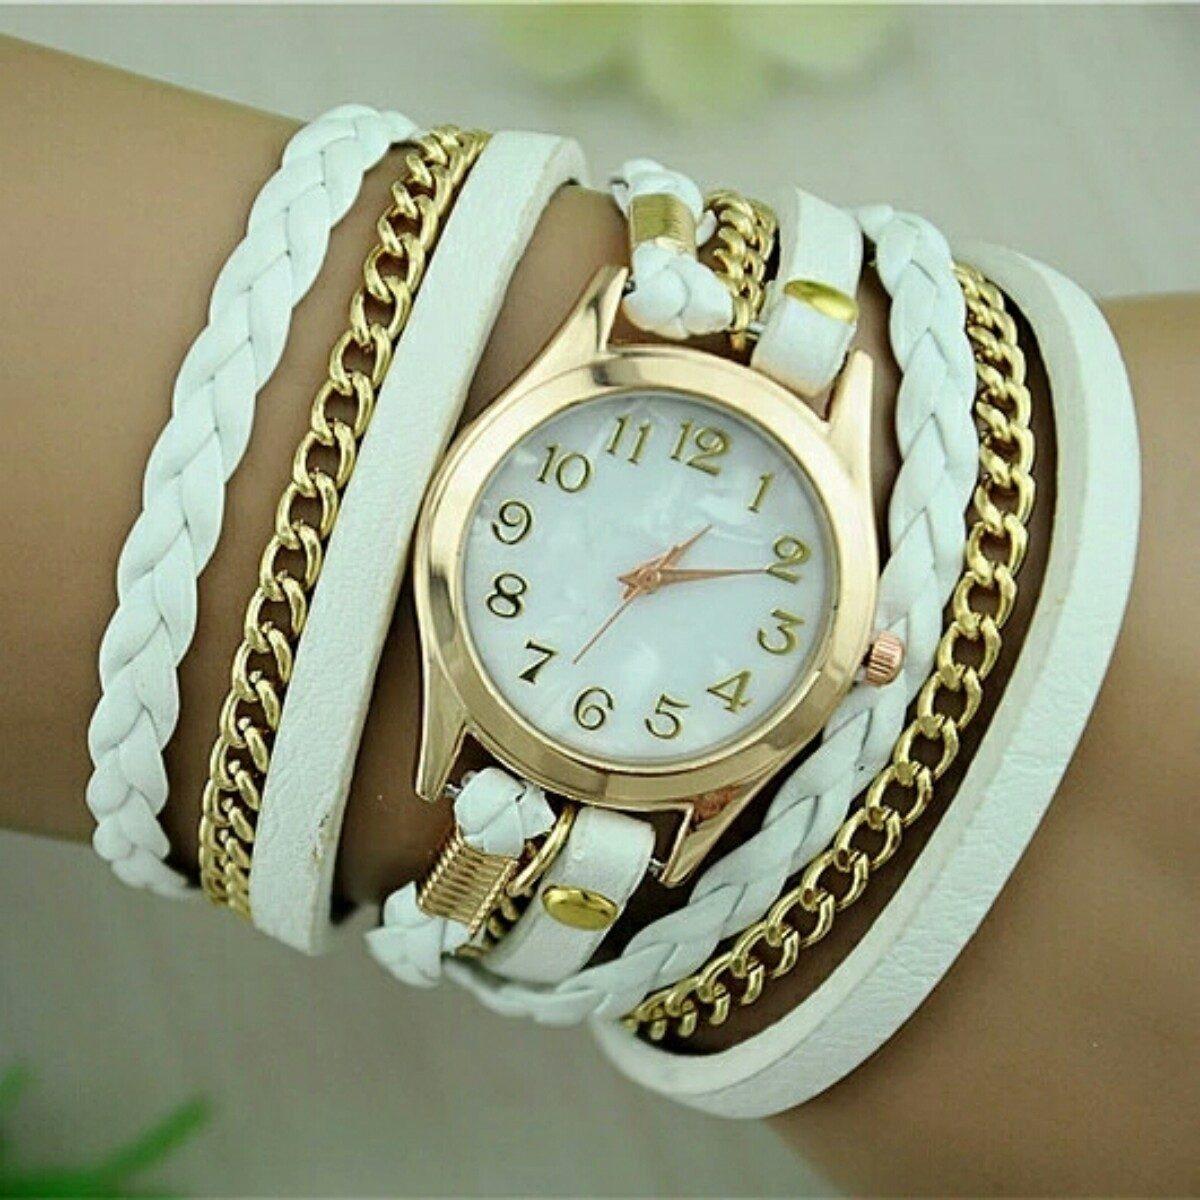 bf6f9d9d7e0 relógio feminino bracelete dourado pronta entrega barato top. Carregando  zoom.